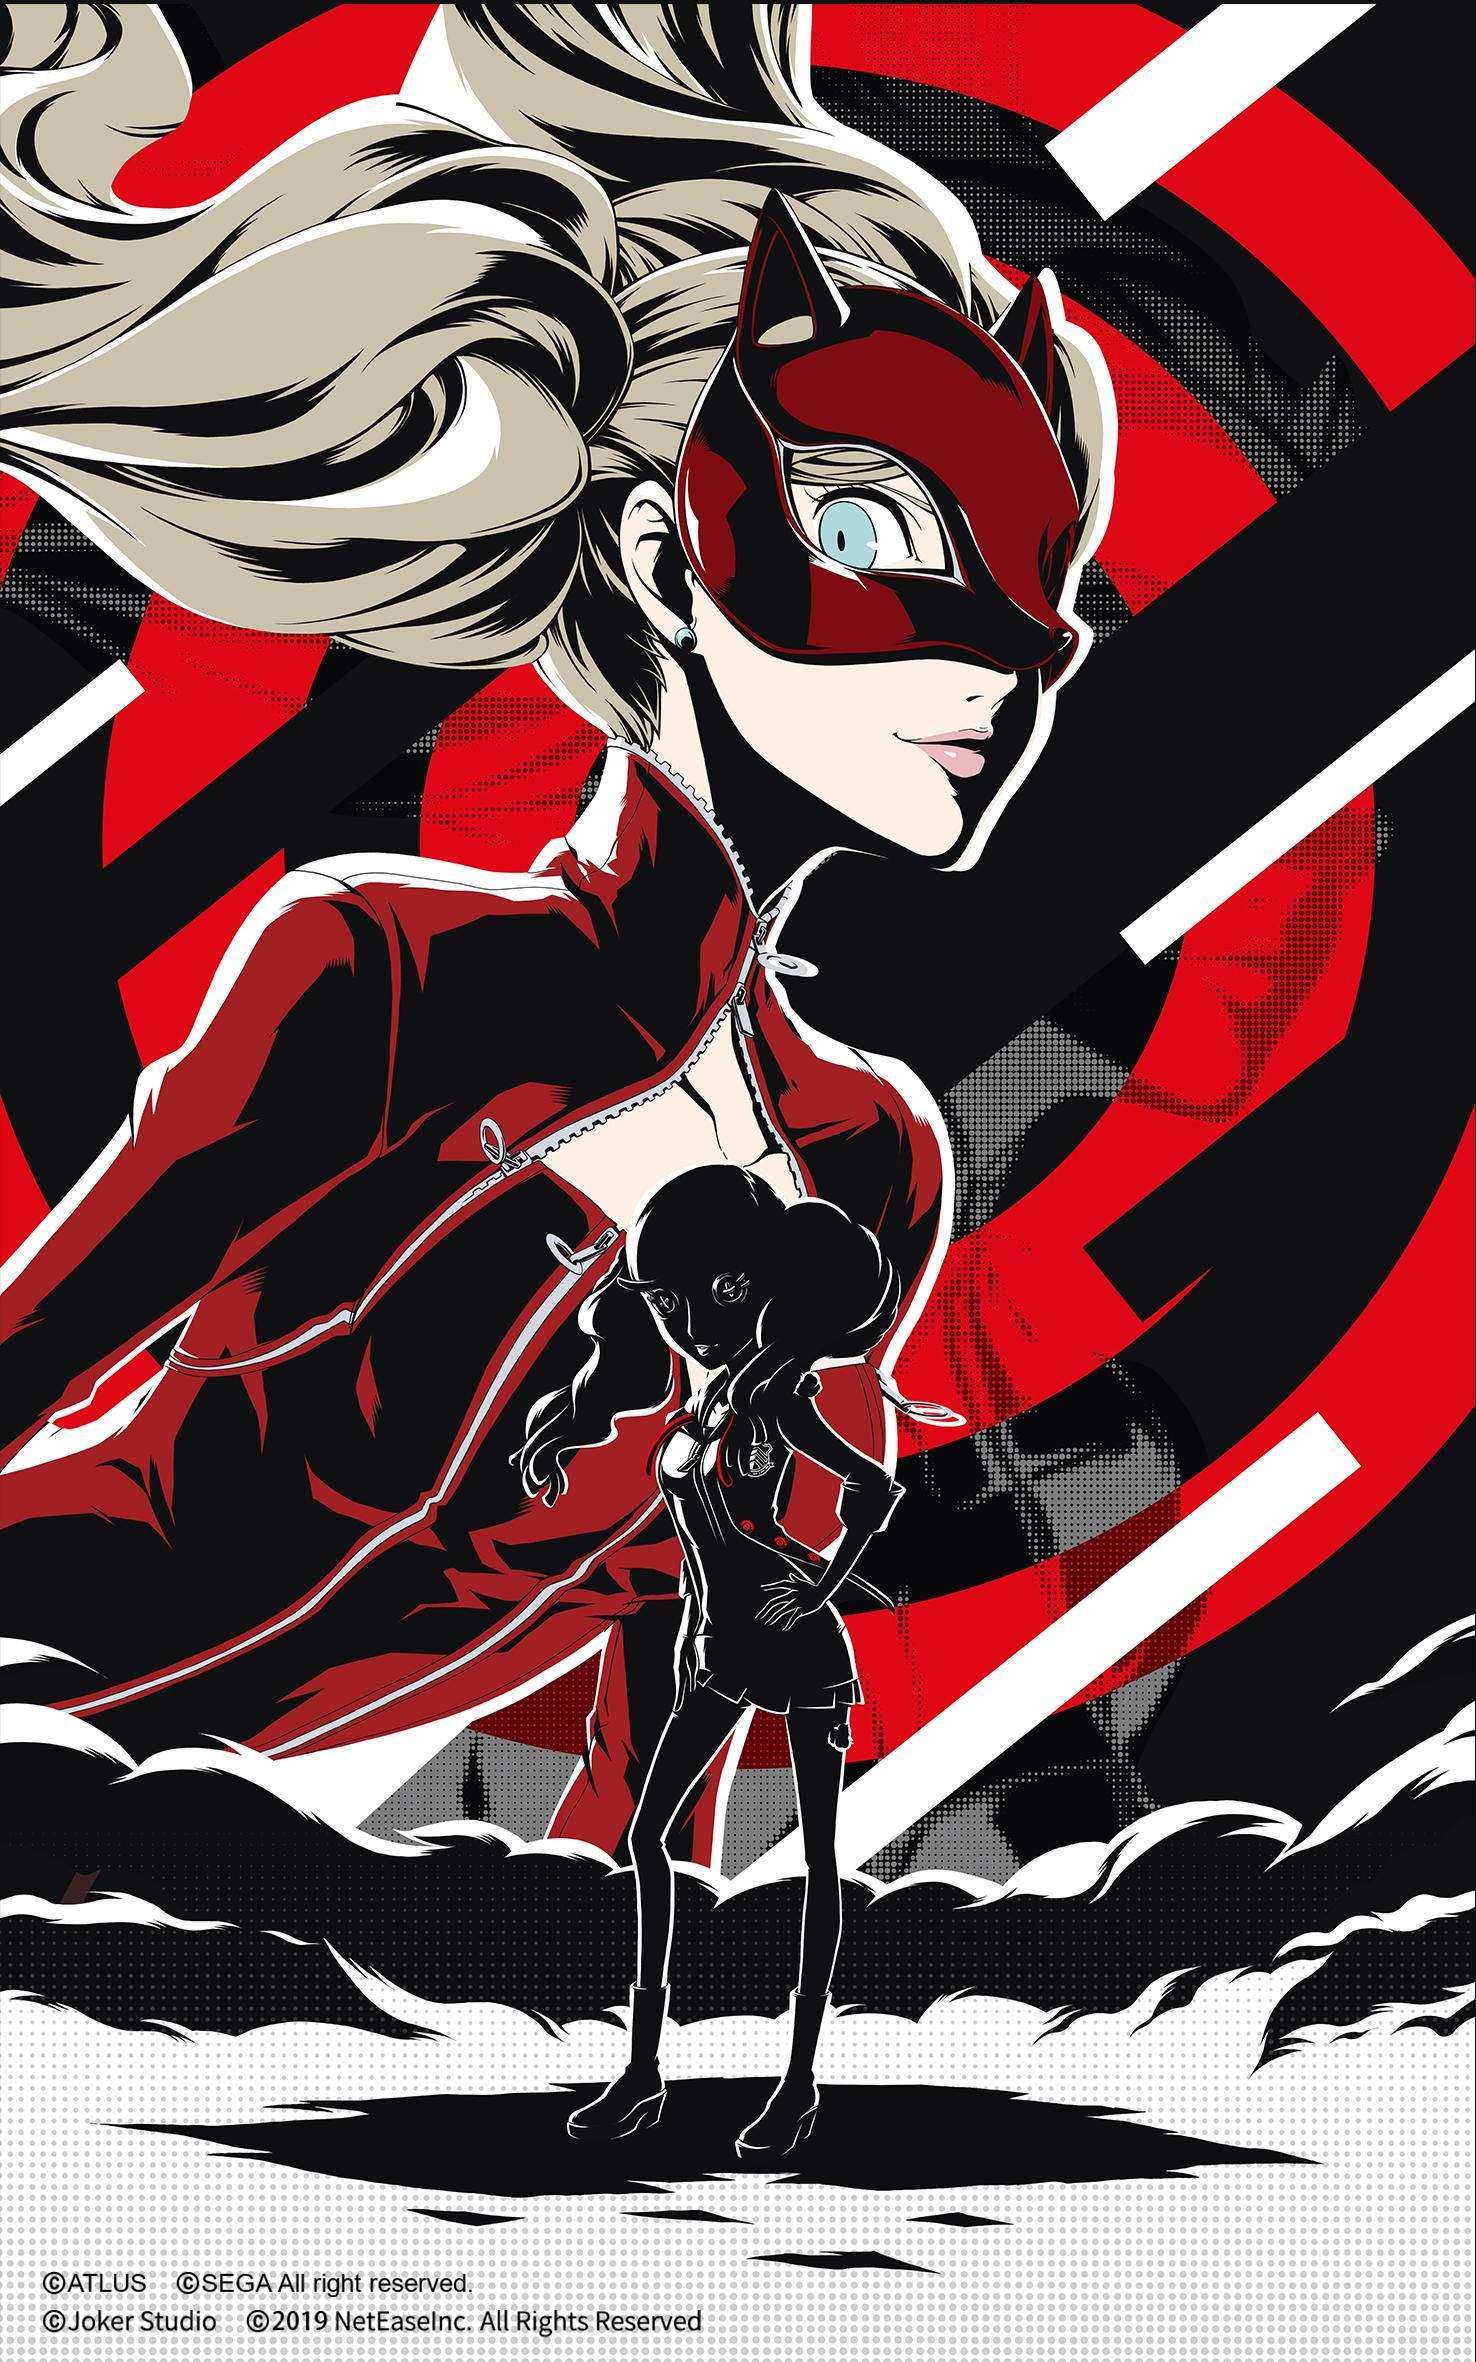 Persona 5 x Identity V Collaboration Announced, Teaser